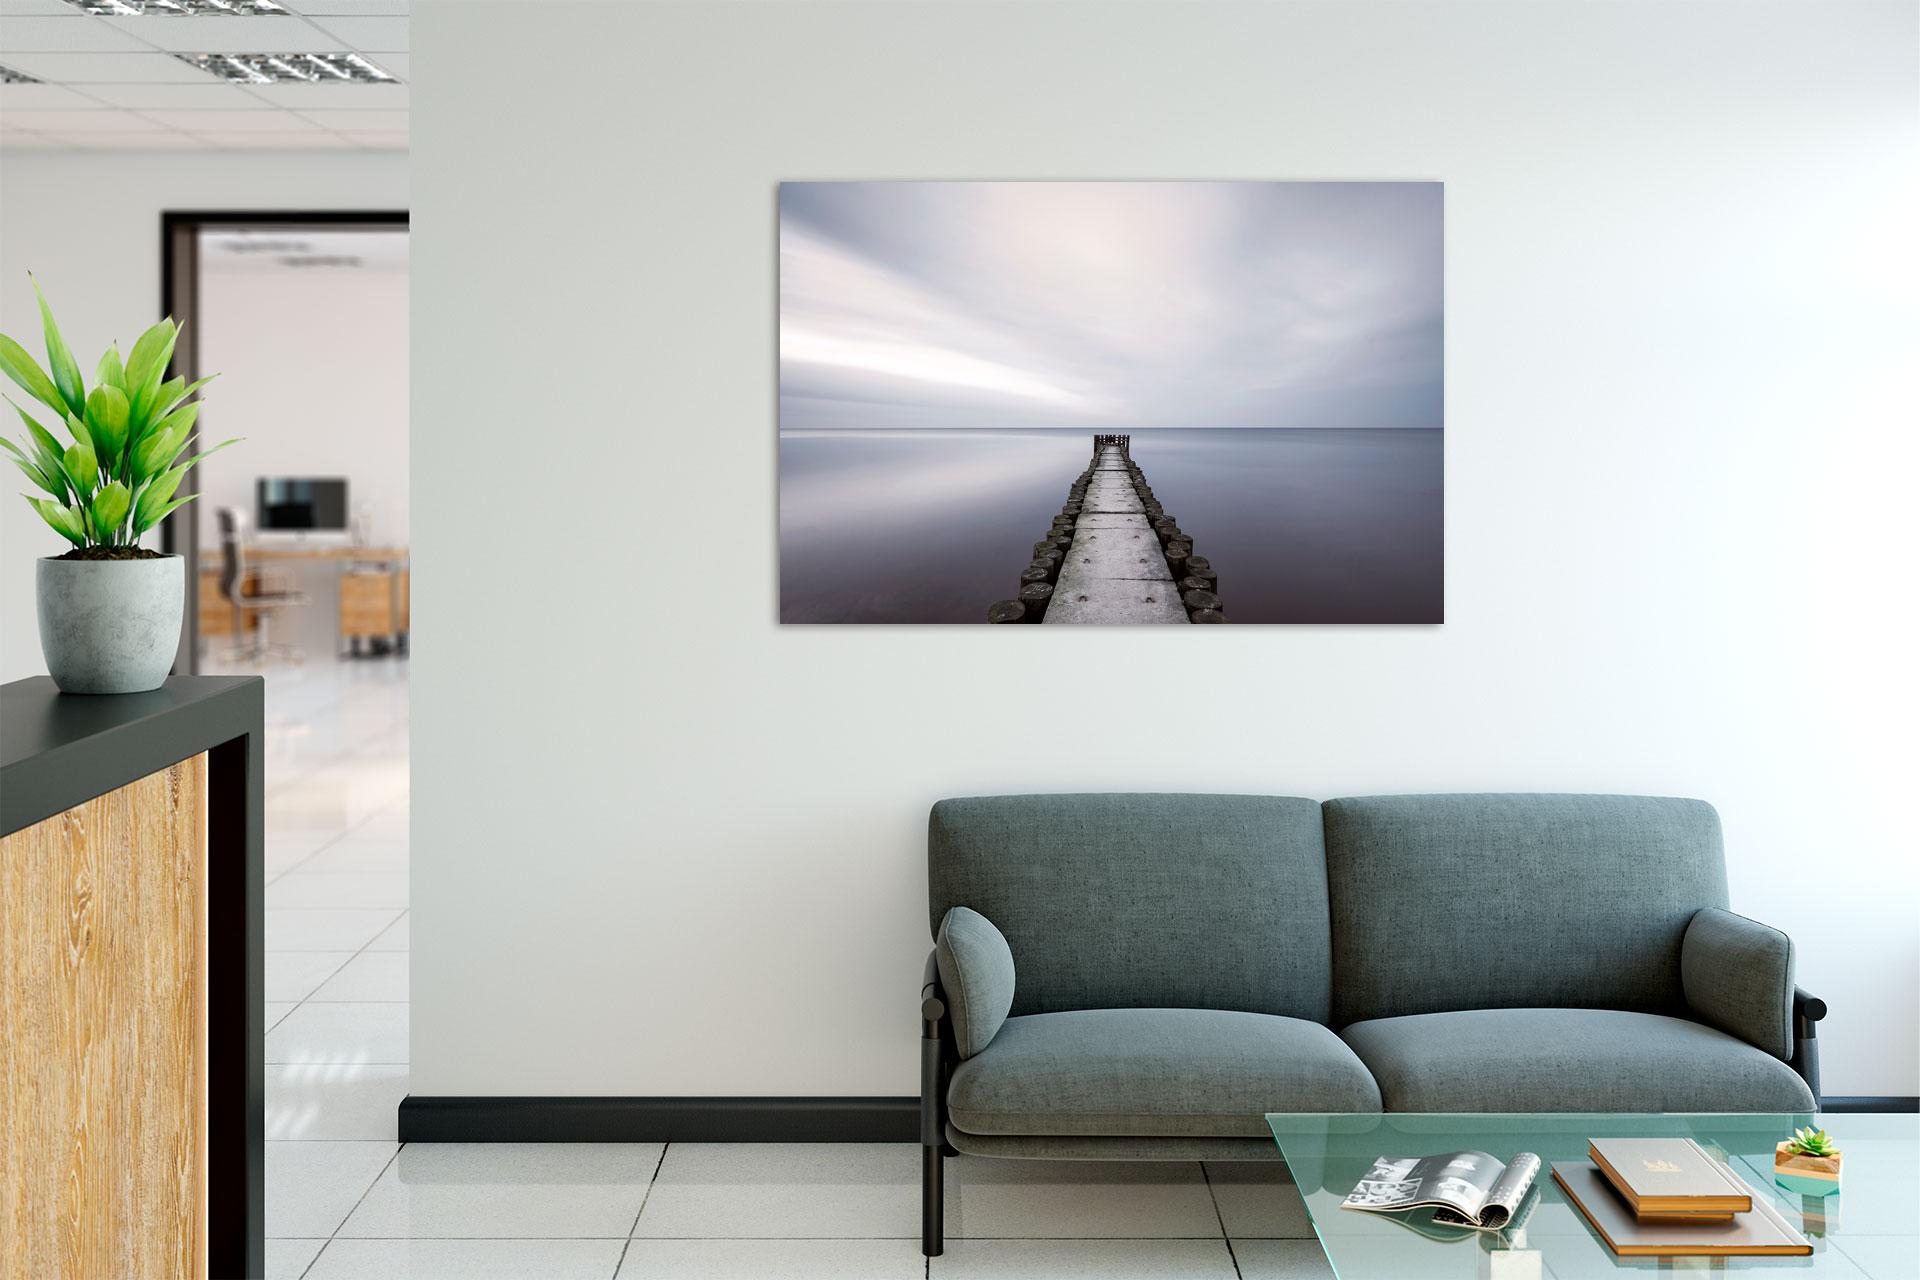 LCW494-stille-ostsee-wandbild-bild-auf-leinwand-acrylglas-aludibond-empfang